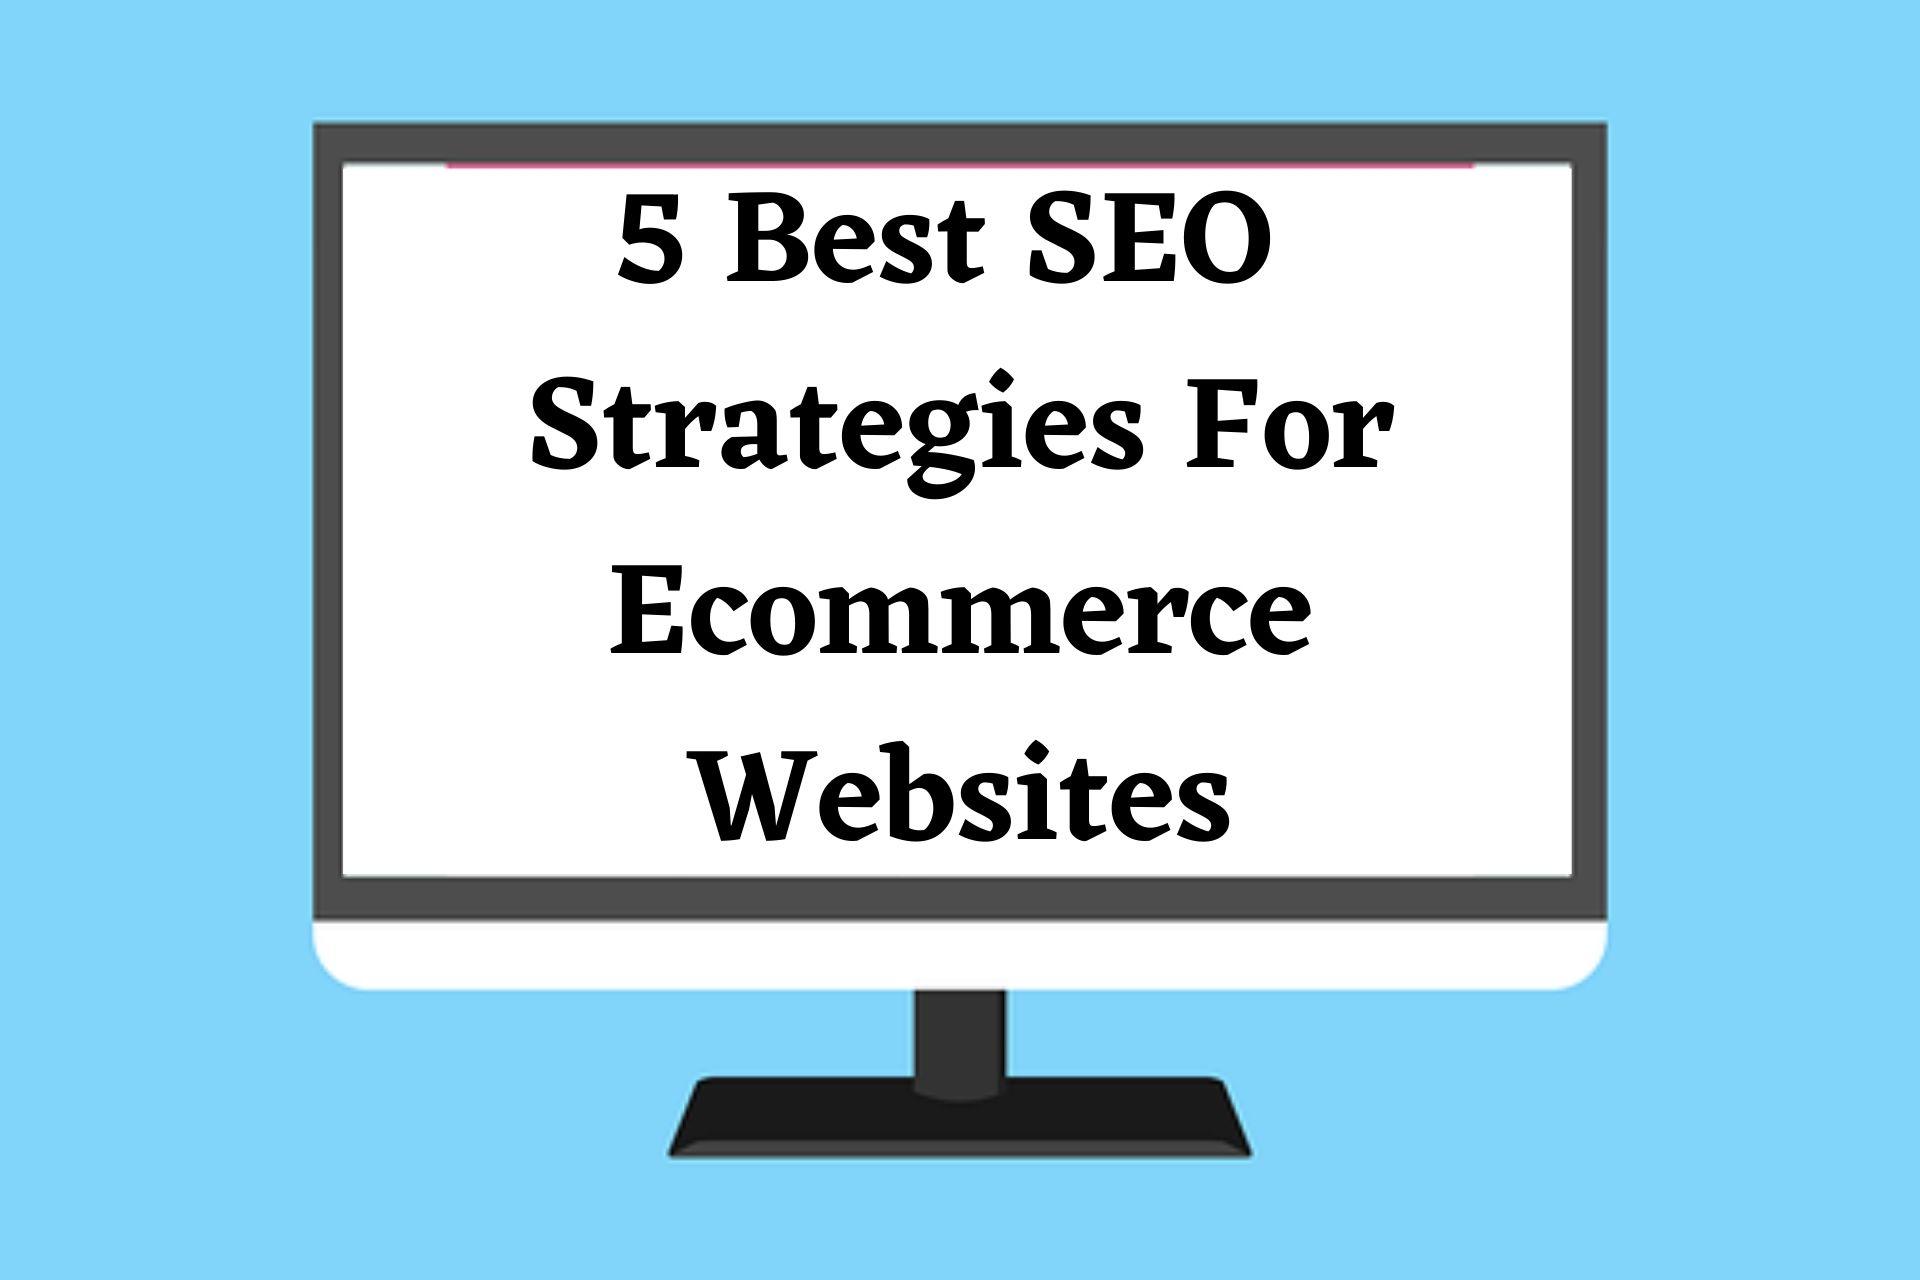 Best SEO Strategies For Ecommerce Websites